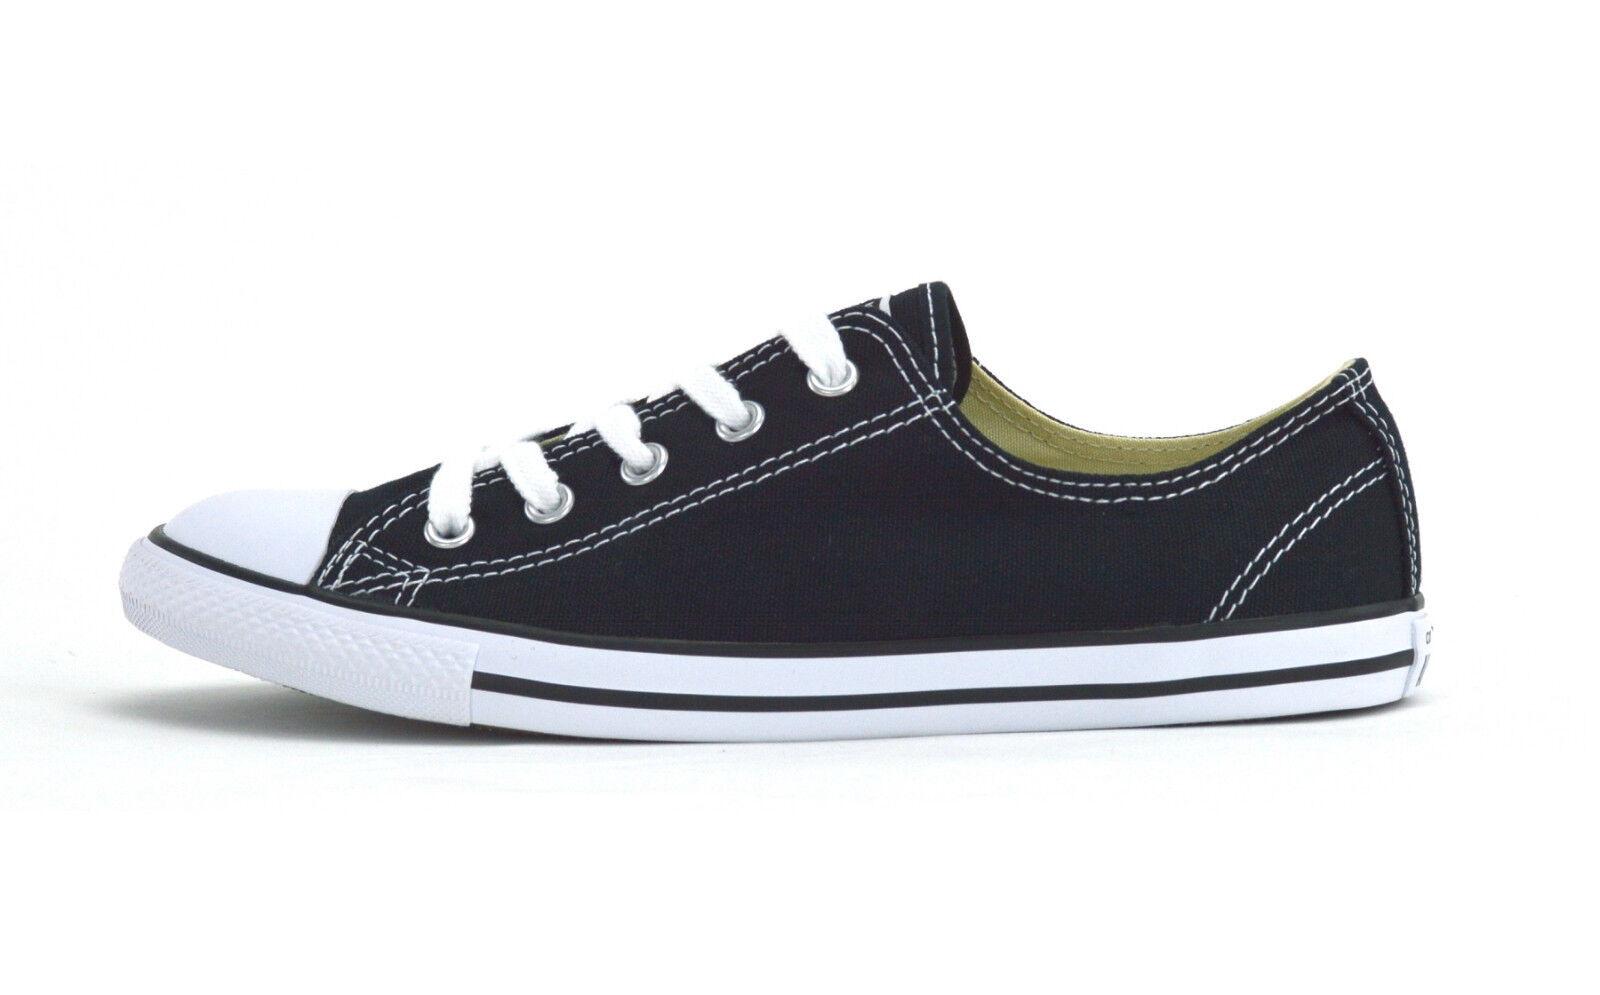 Converse All DAINTY Star CT DAINTY All OX -530054 C-Chaussures Femme Baskets-Noir/Blanc-Neuf 9cdf2c